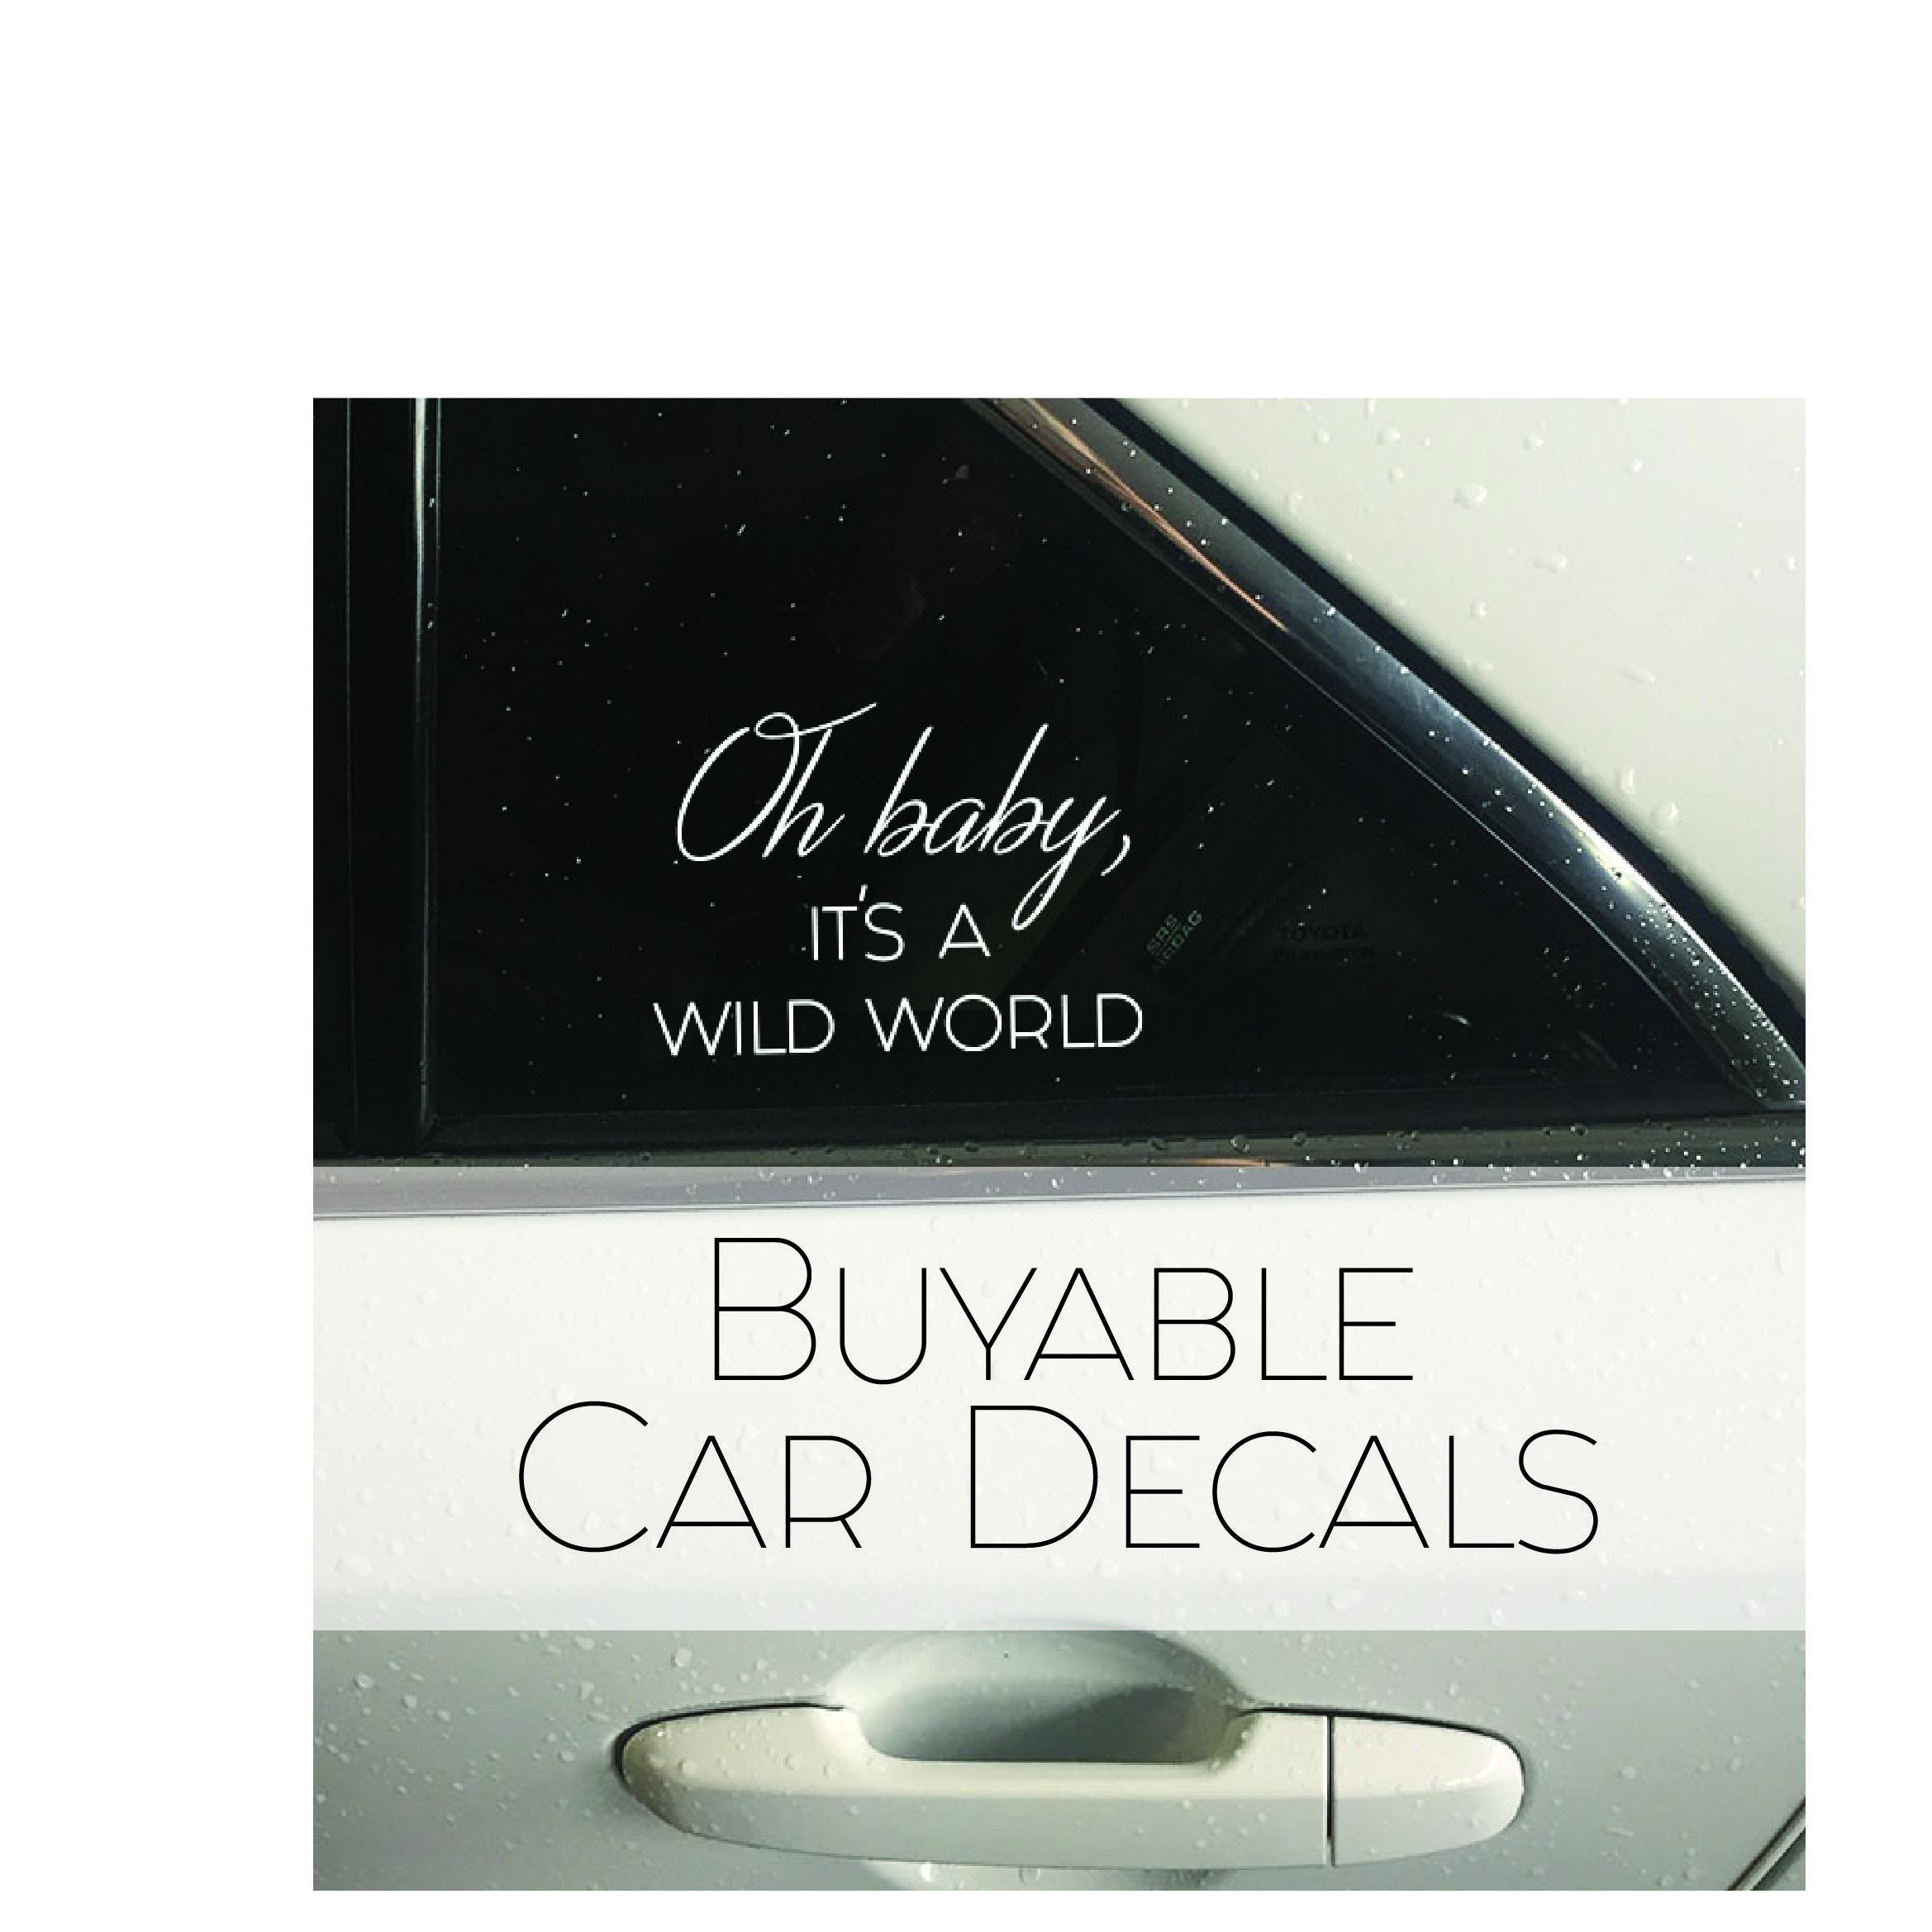 Car decal ideas car decals decals car car decals vinyl vehicle decals car vinyl decals car sticker